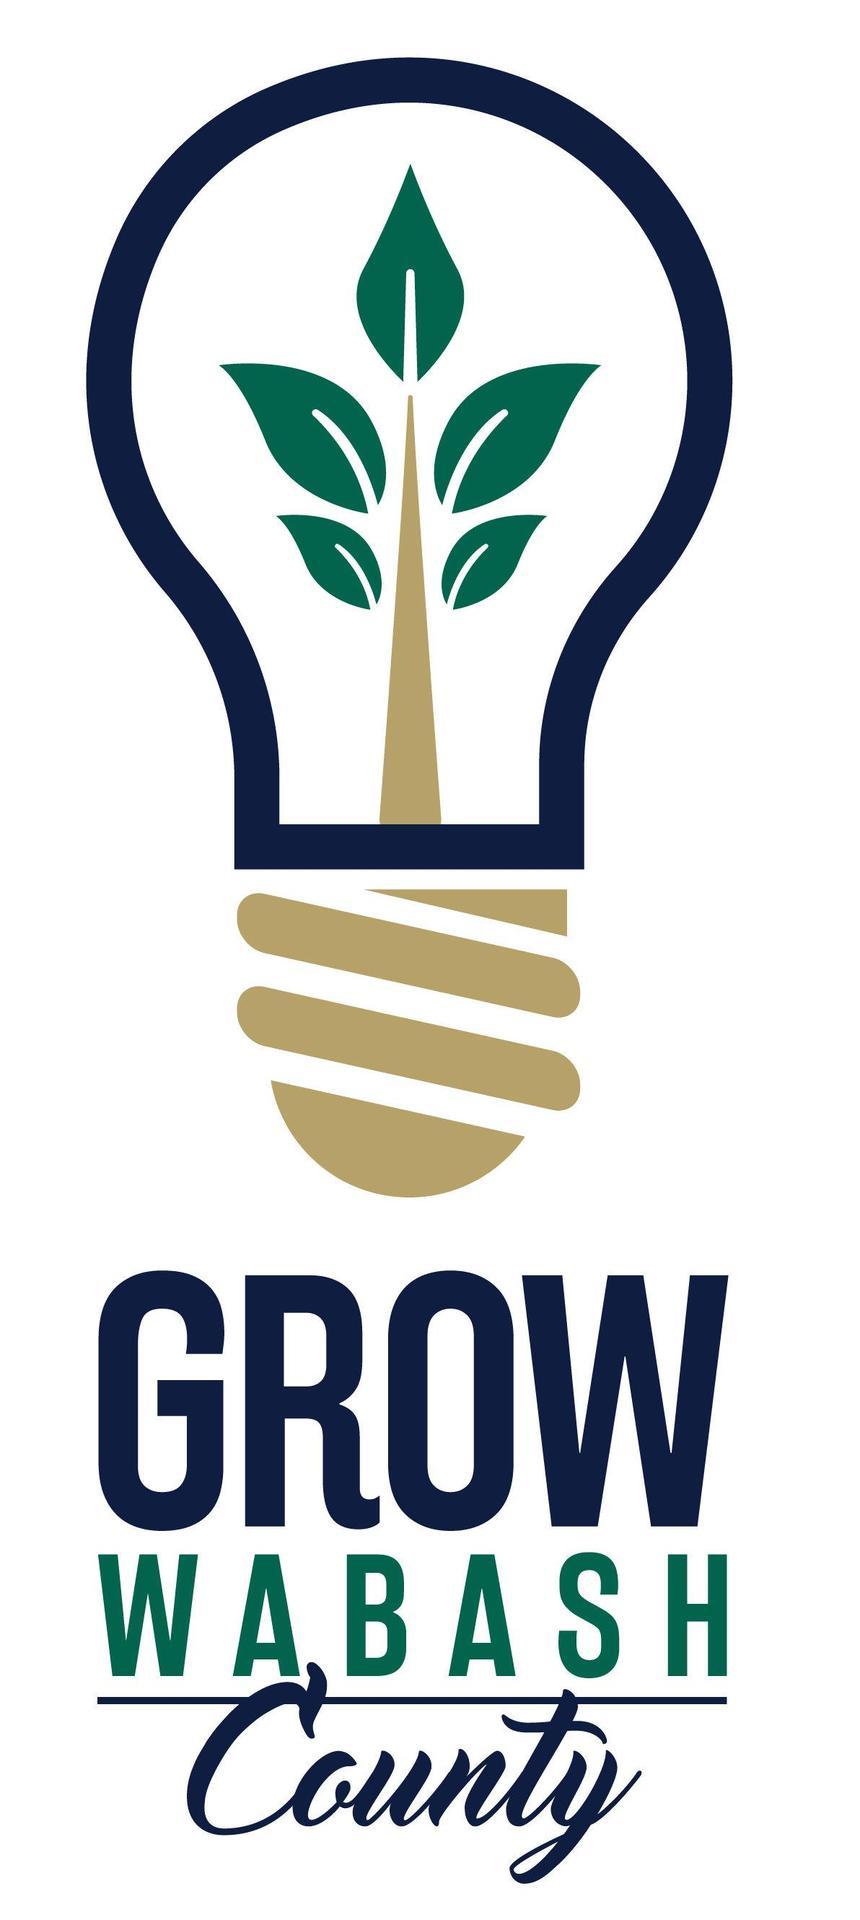 Grow Wabash County Logo